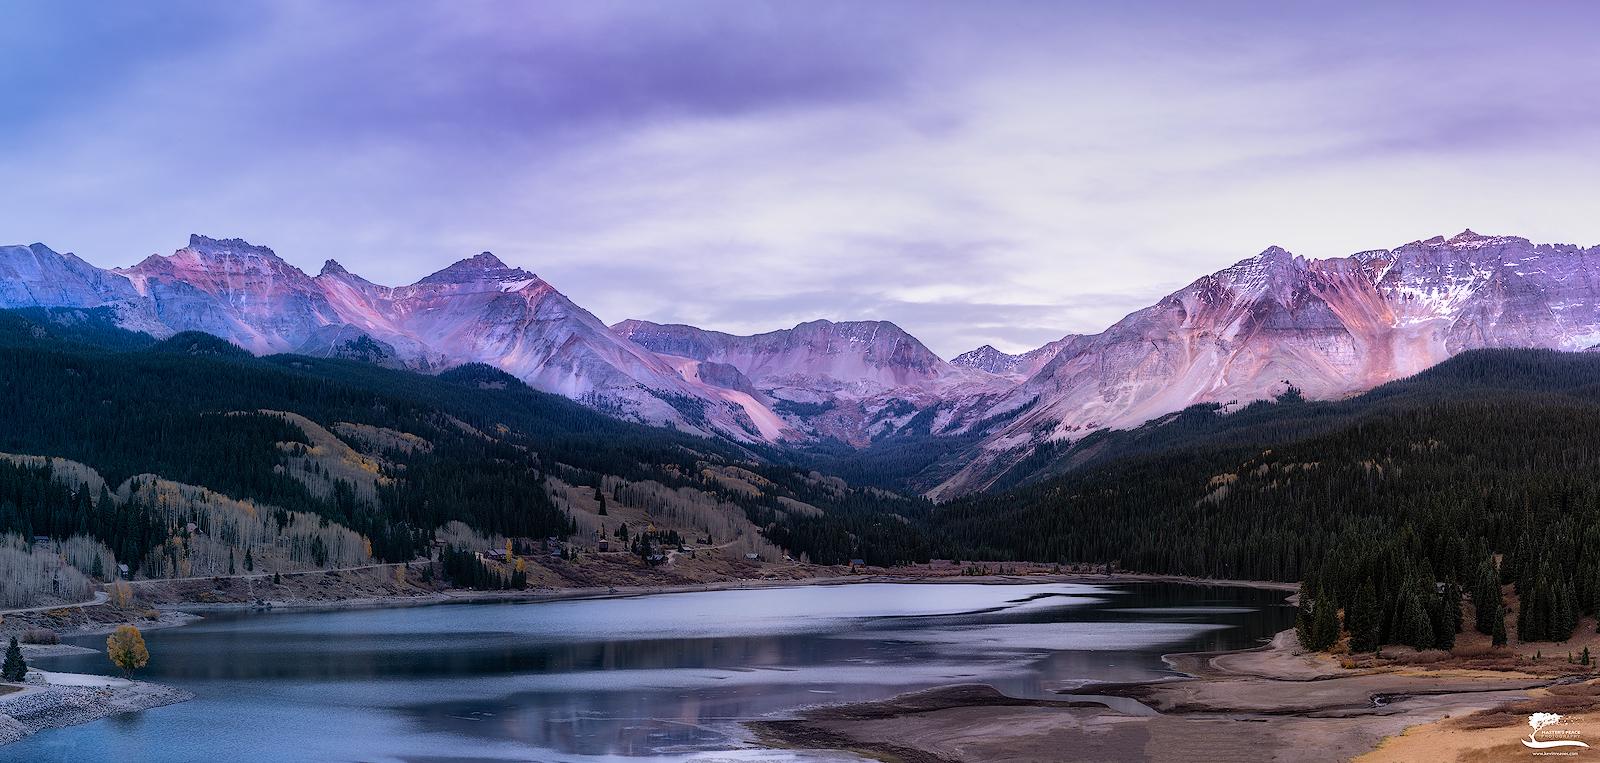 pano, colorado, mountains, sunset, glow, photo